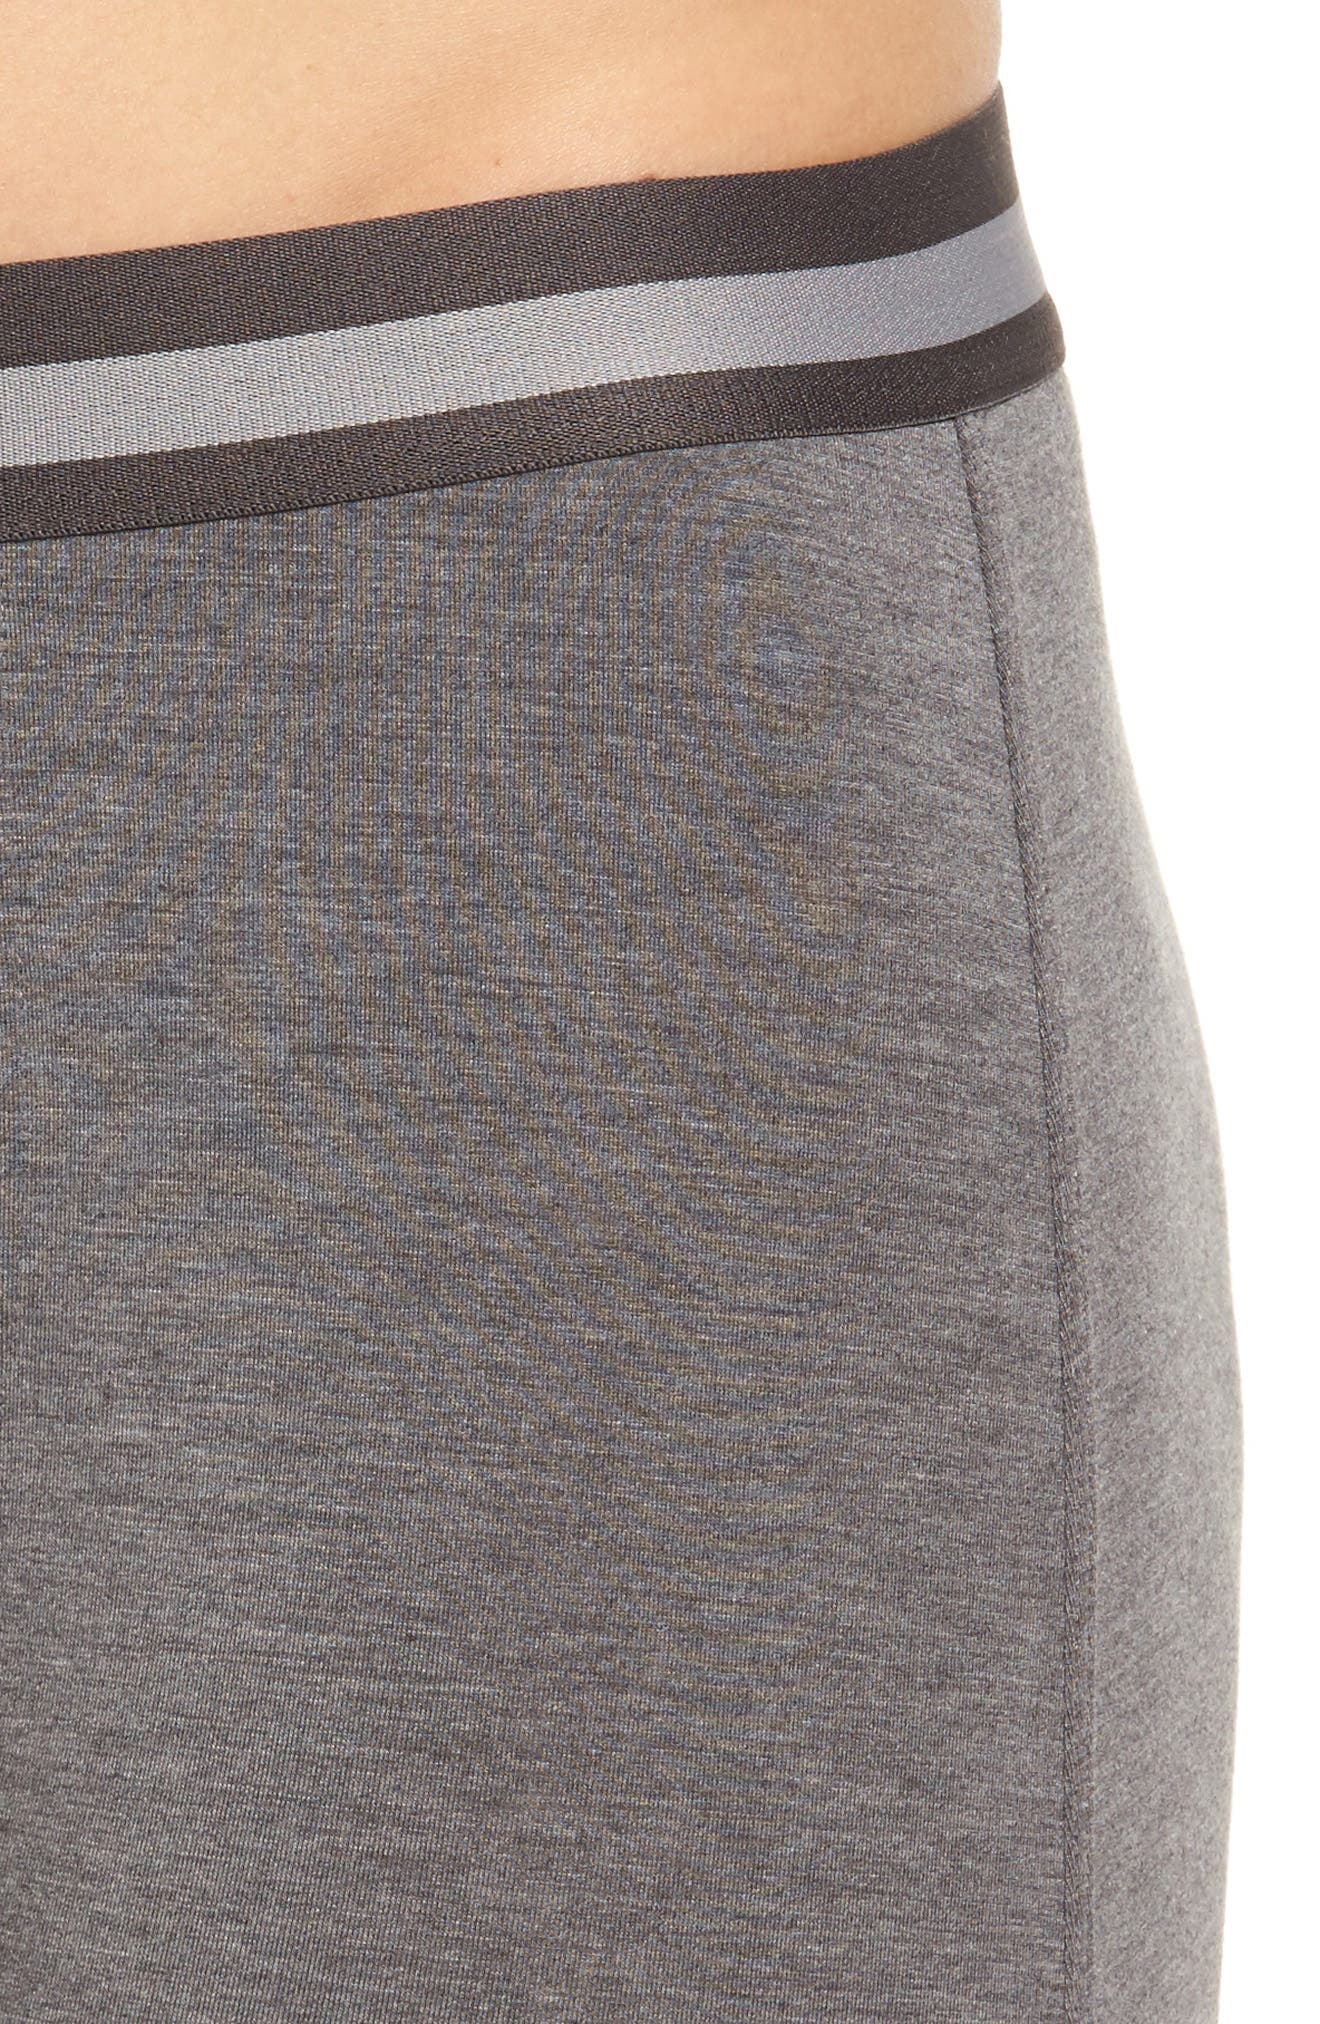 Thermal Long Johns,                             Alternate thumbnail 4, color,                             Charcoal